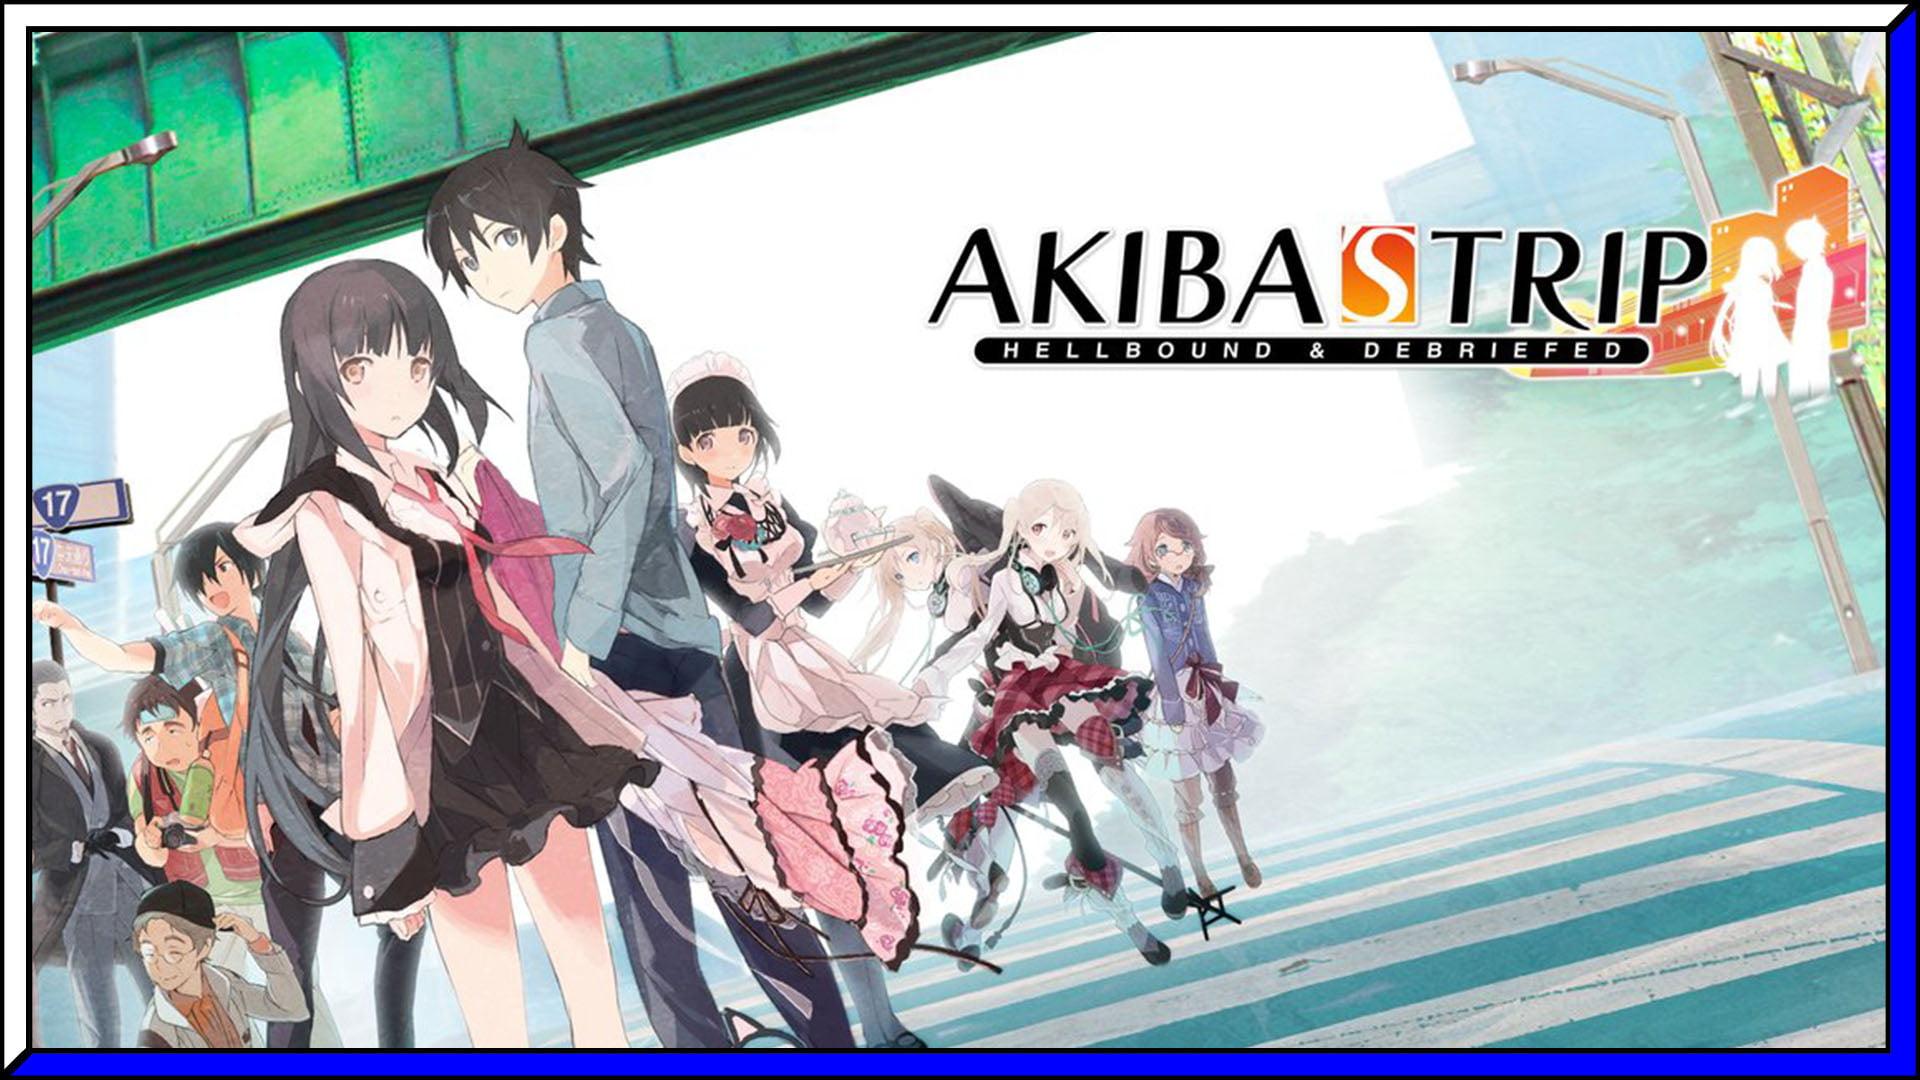 AKIBA'S TRIP Hellbound Debriefed Fi3